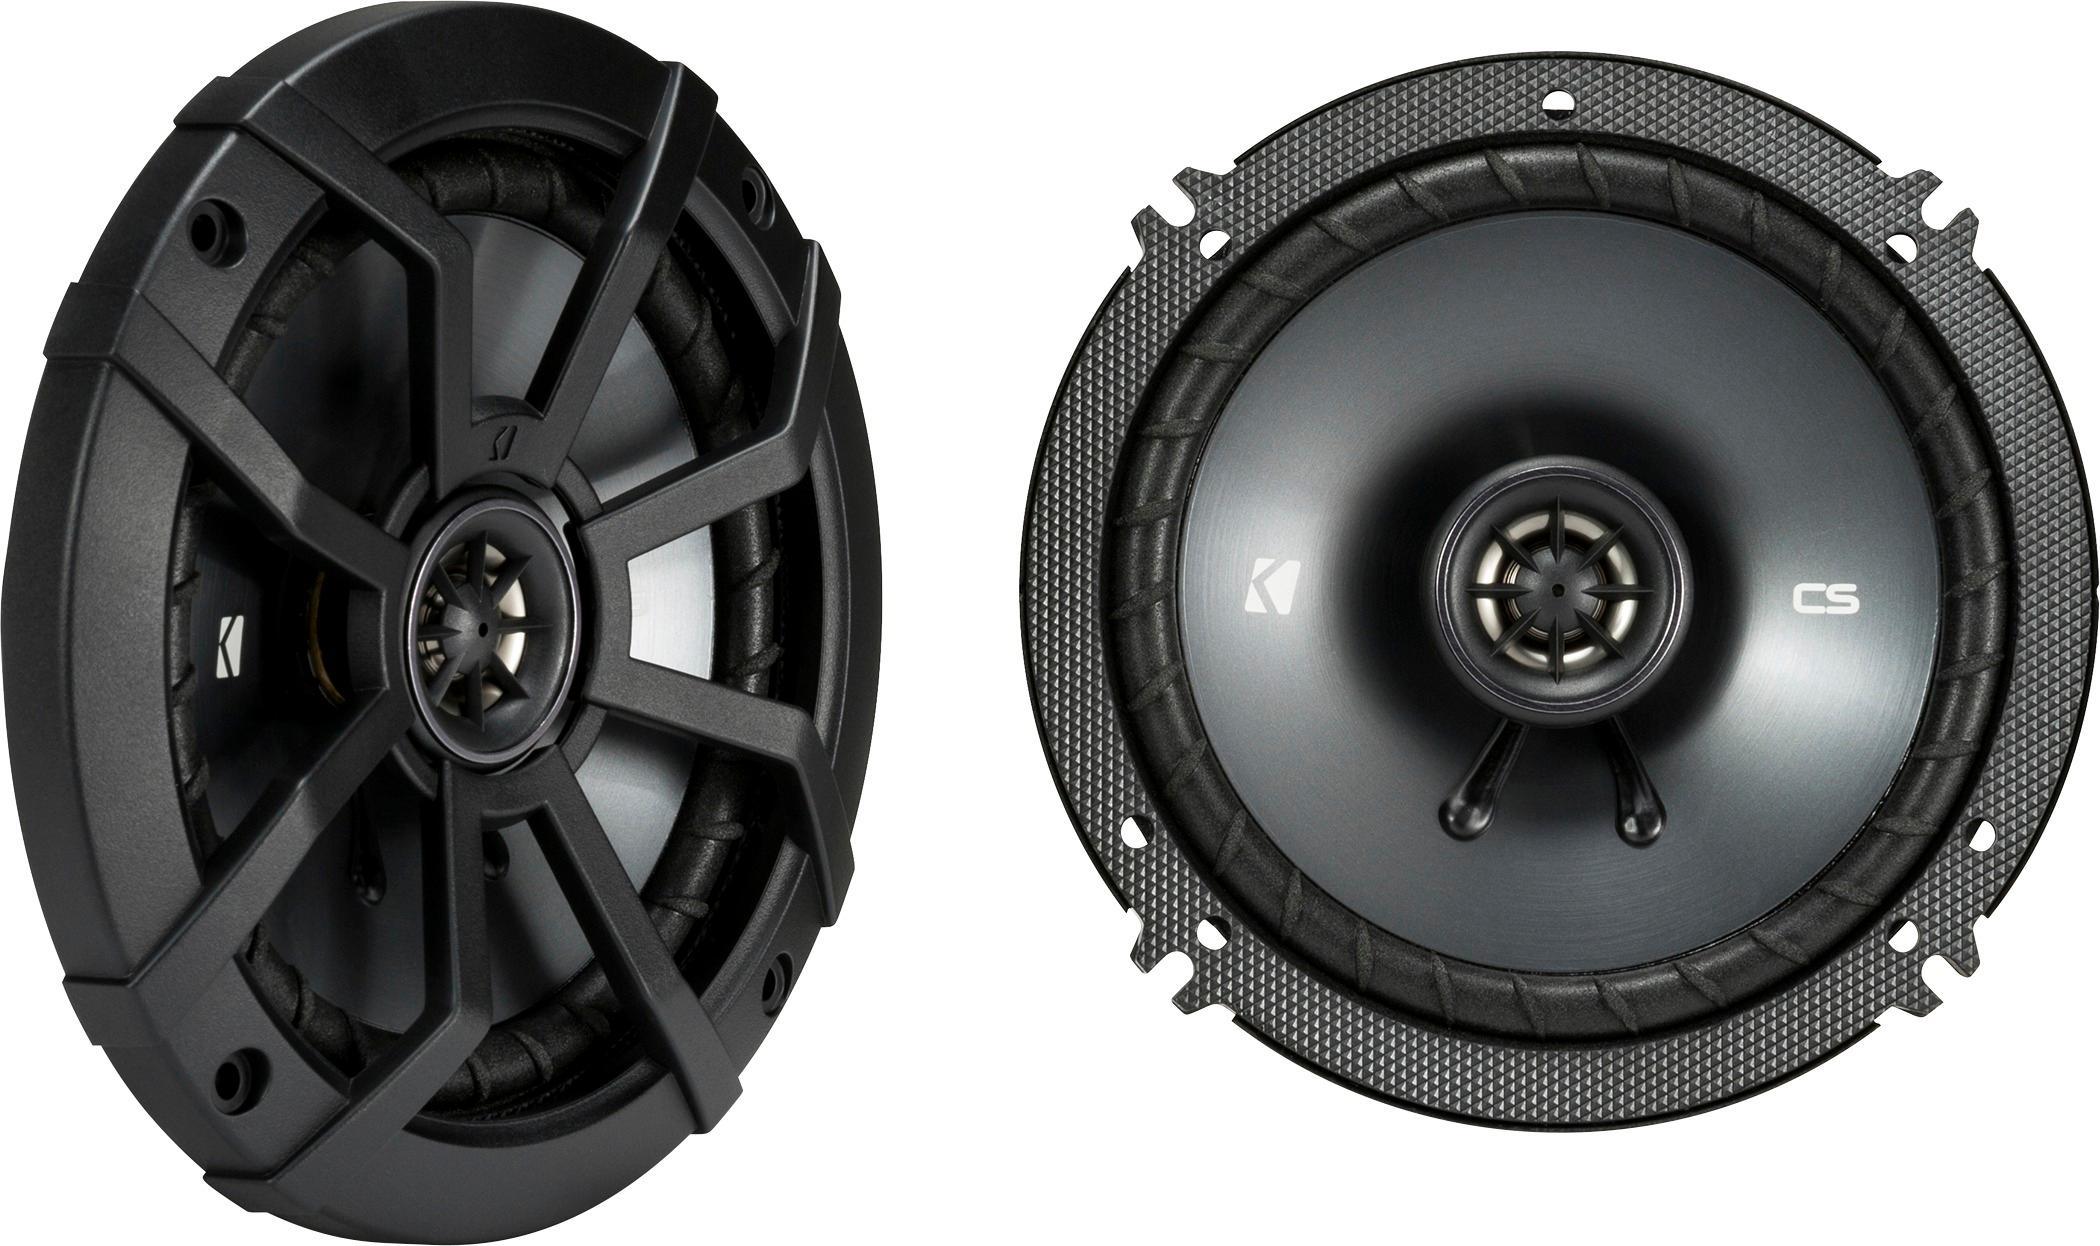 "KICKER - CS Series 6-1/2"" 2-Way Car Speakers with Polypropylene Cones (Pair) - Black"